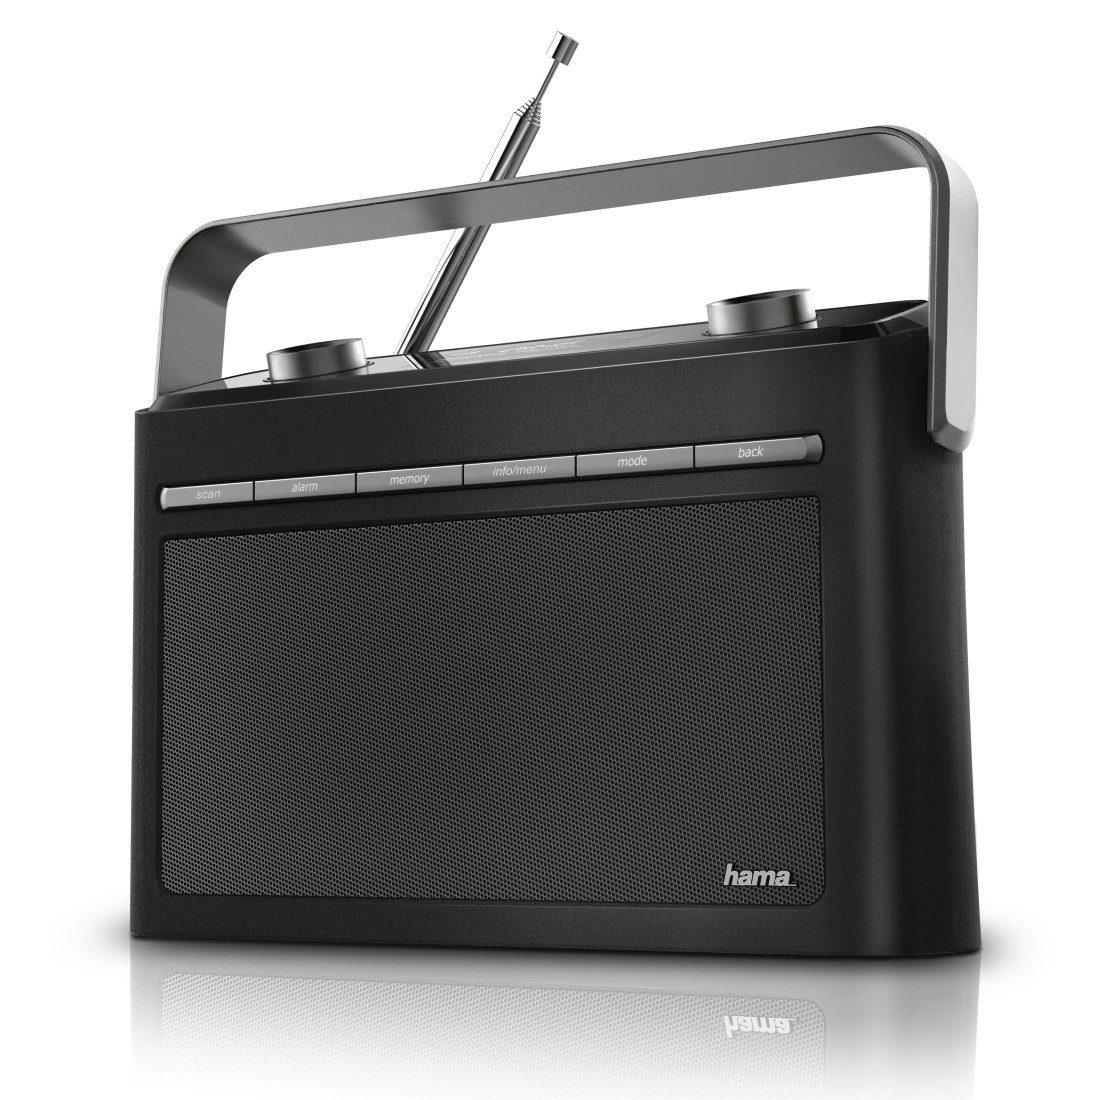 Hama Digitalradio DR50 tragbarer Radiowecker DAB+/DAB/FM/UKW »Netzteil oder Batterie Betrieb«